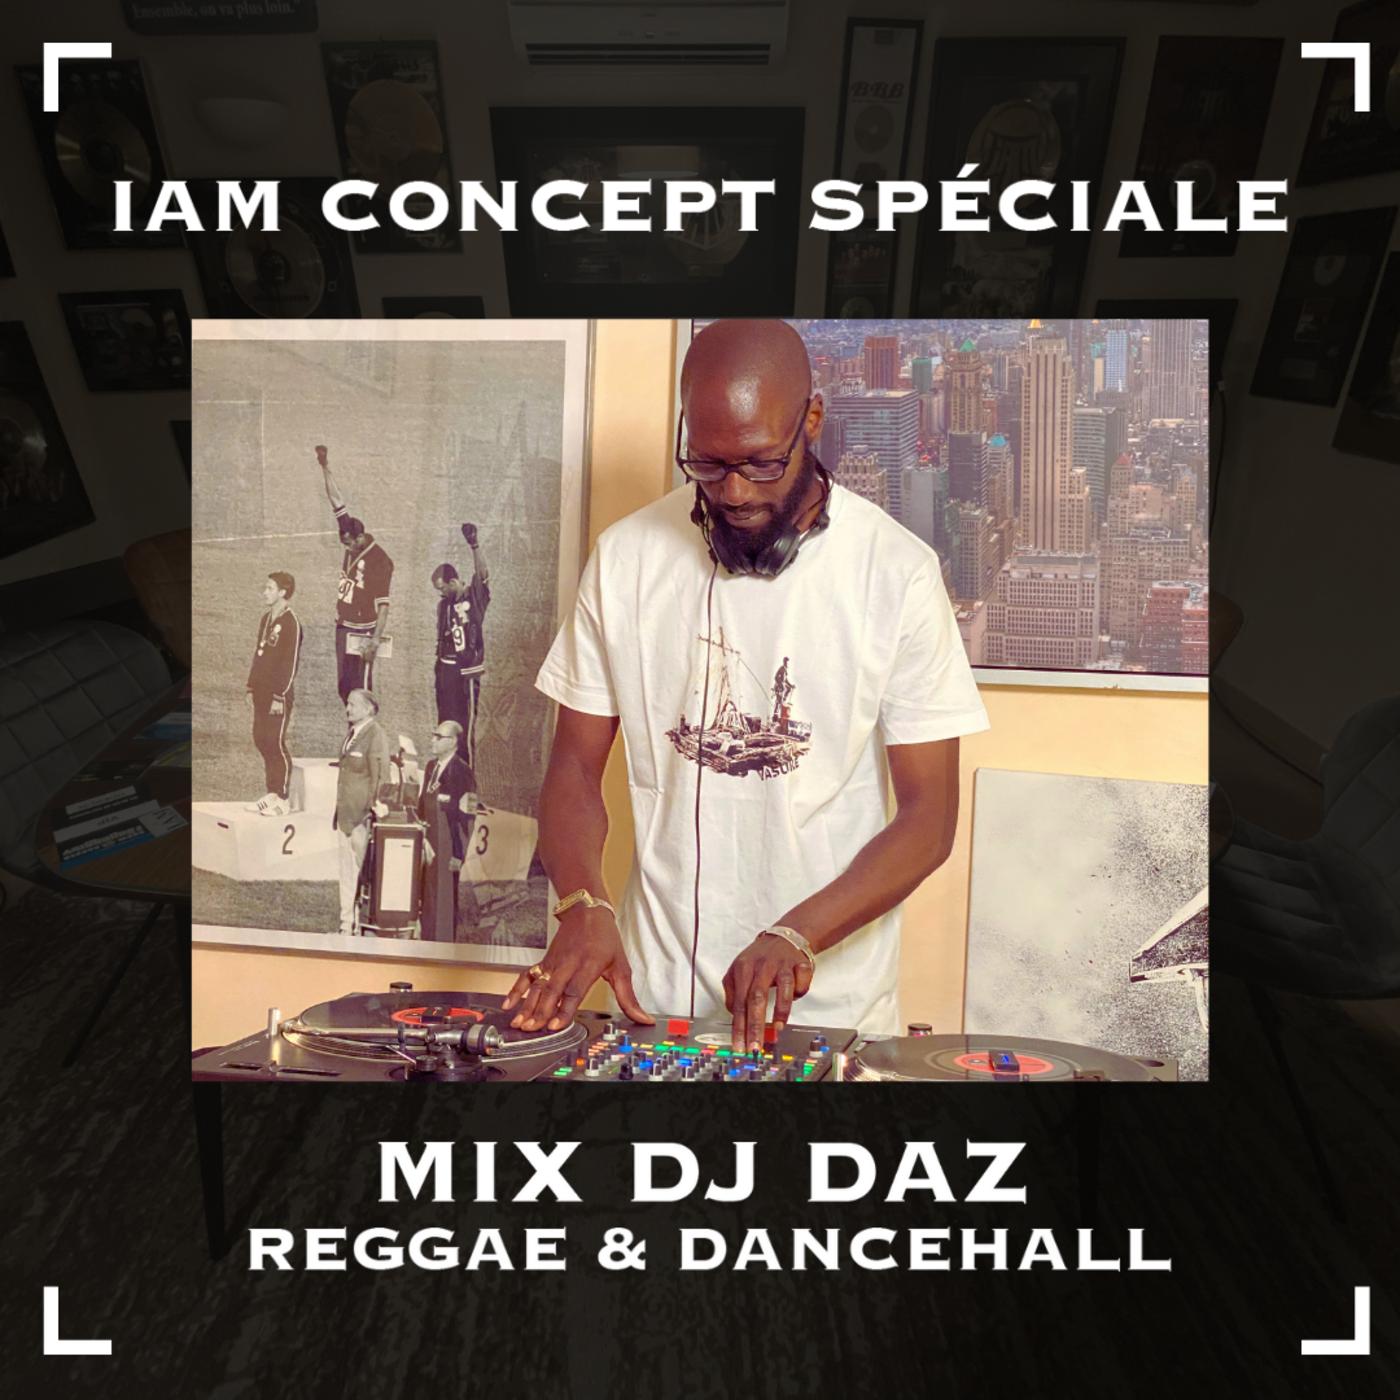 IAM CONCEPT SPECIALE DJ DAZ